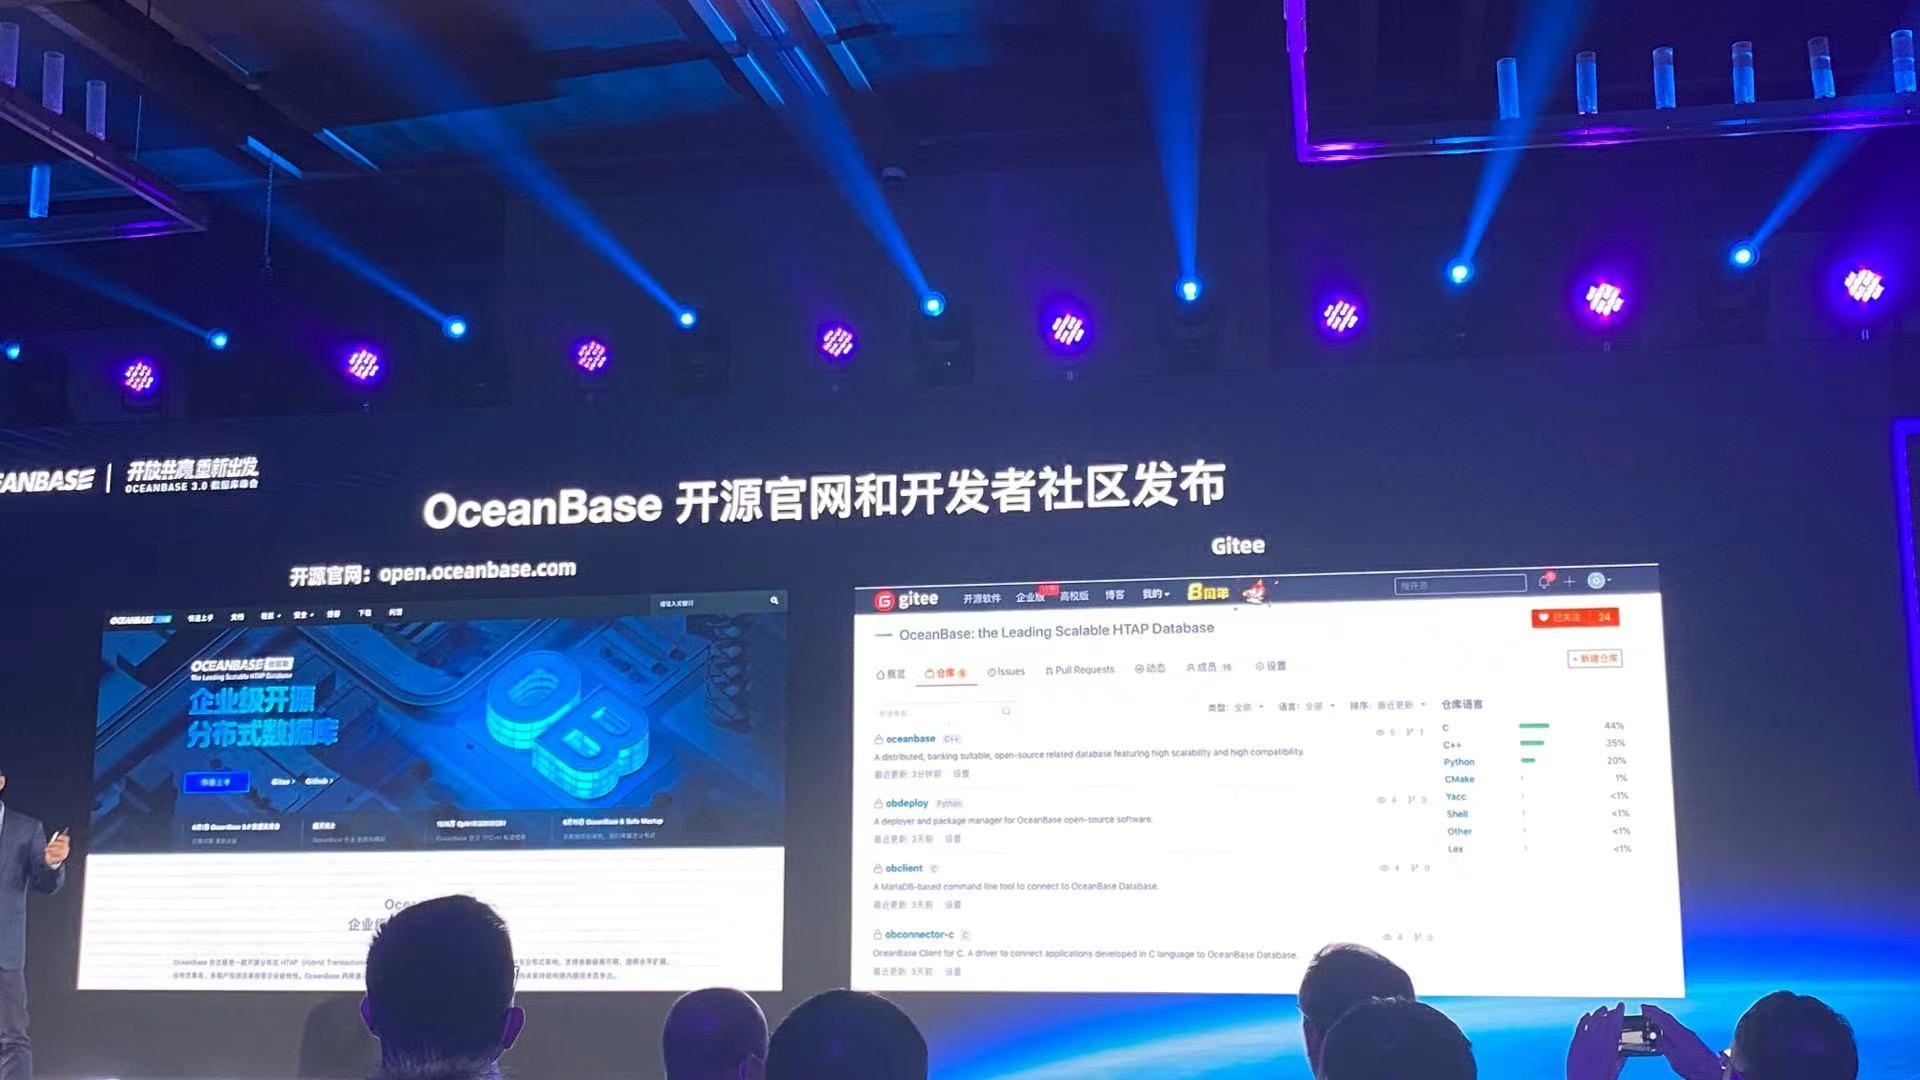 OceanBase 开源,木兰协议、Gitee托管、Open Core